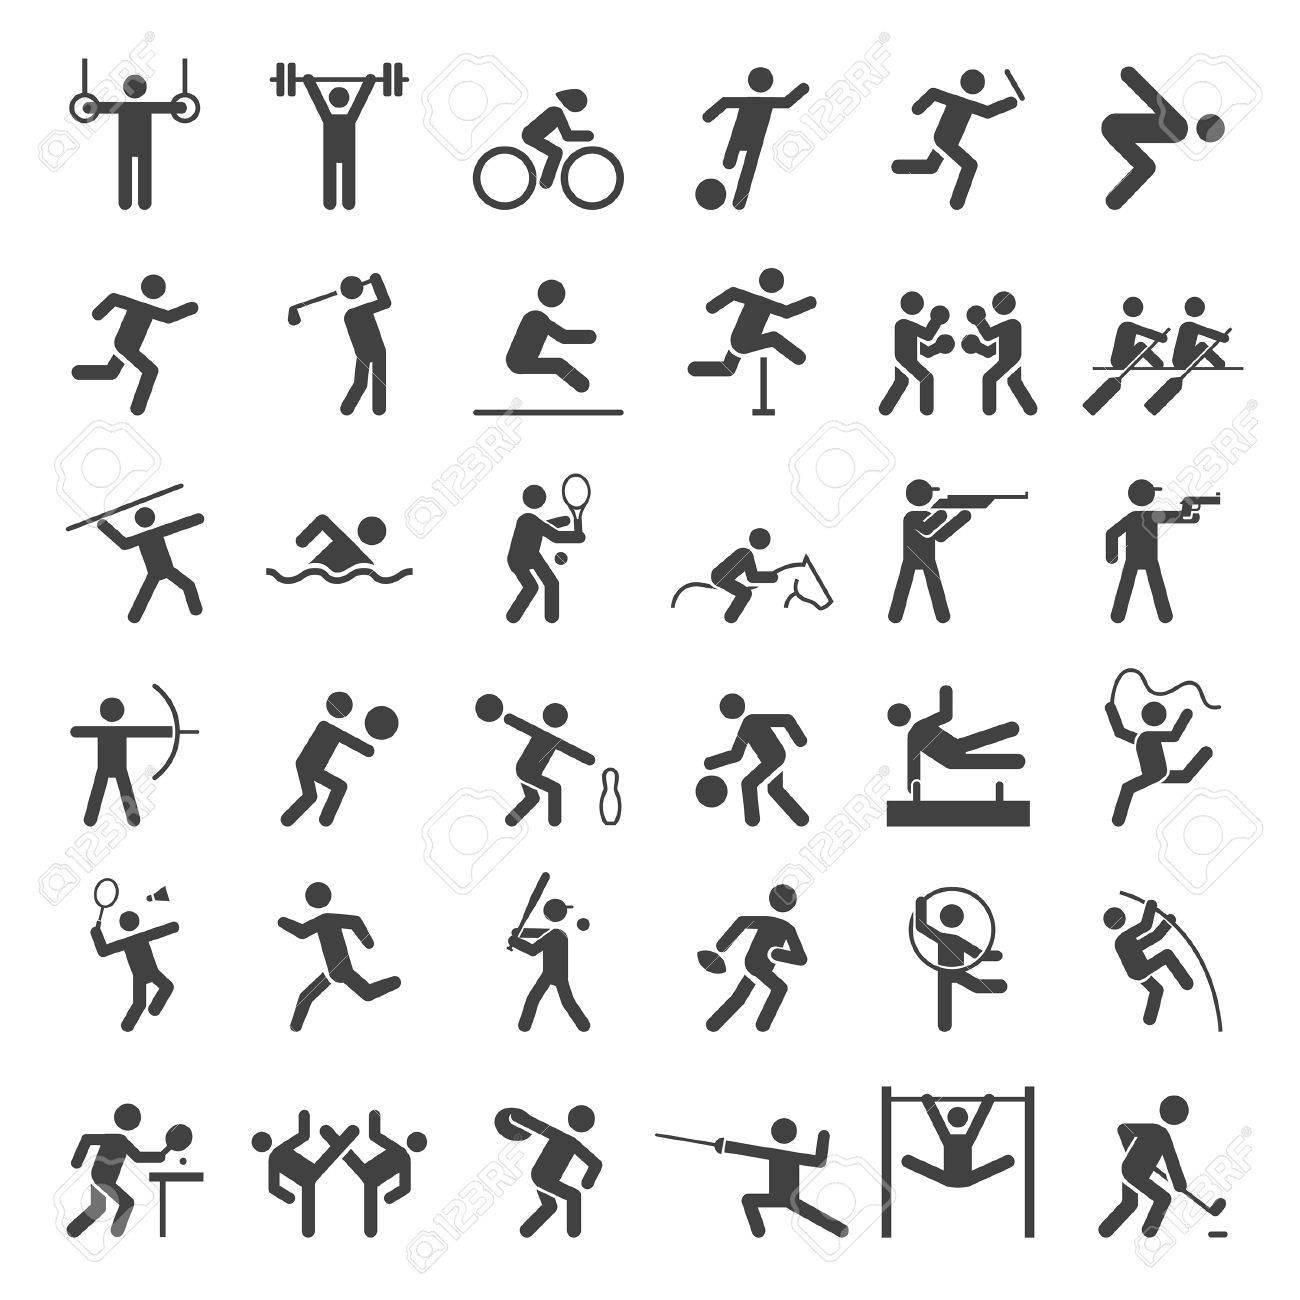 Set of sport icons. illustration. - 57844709